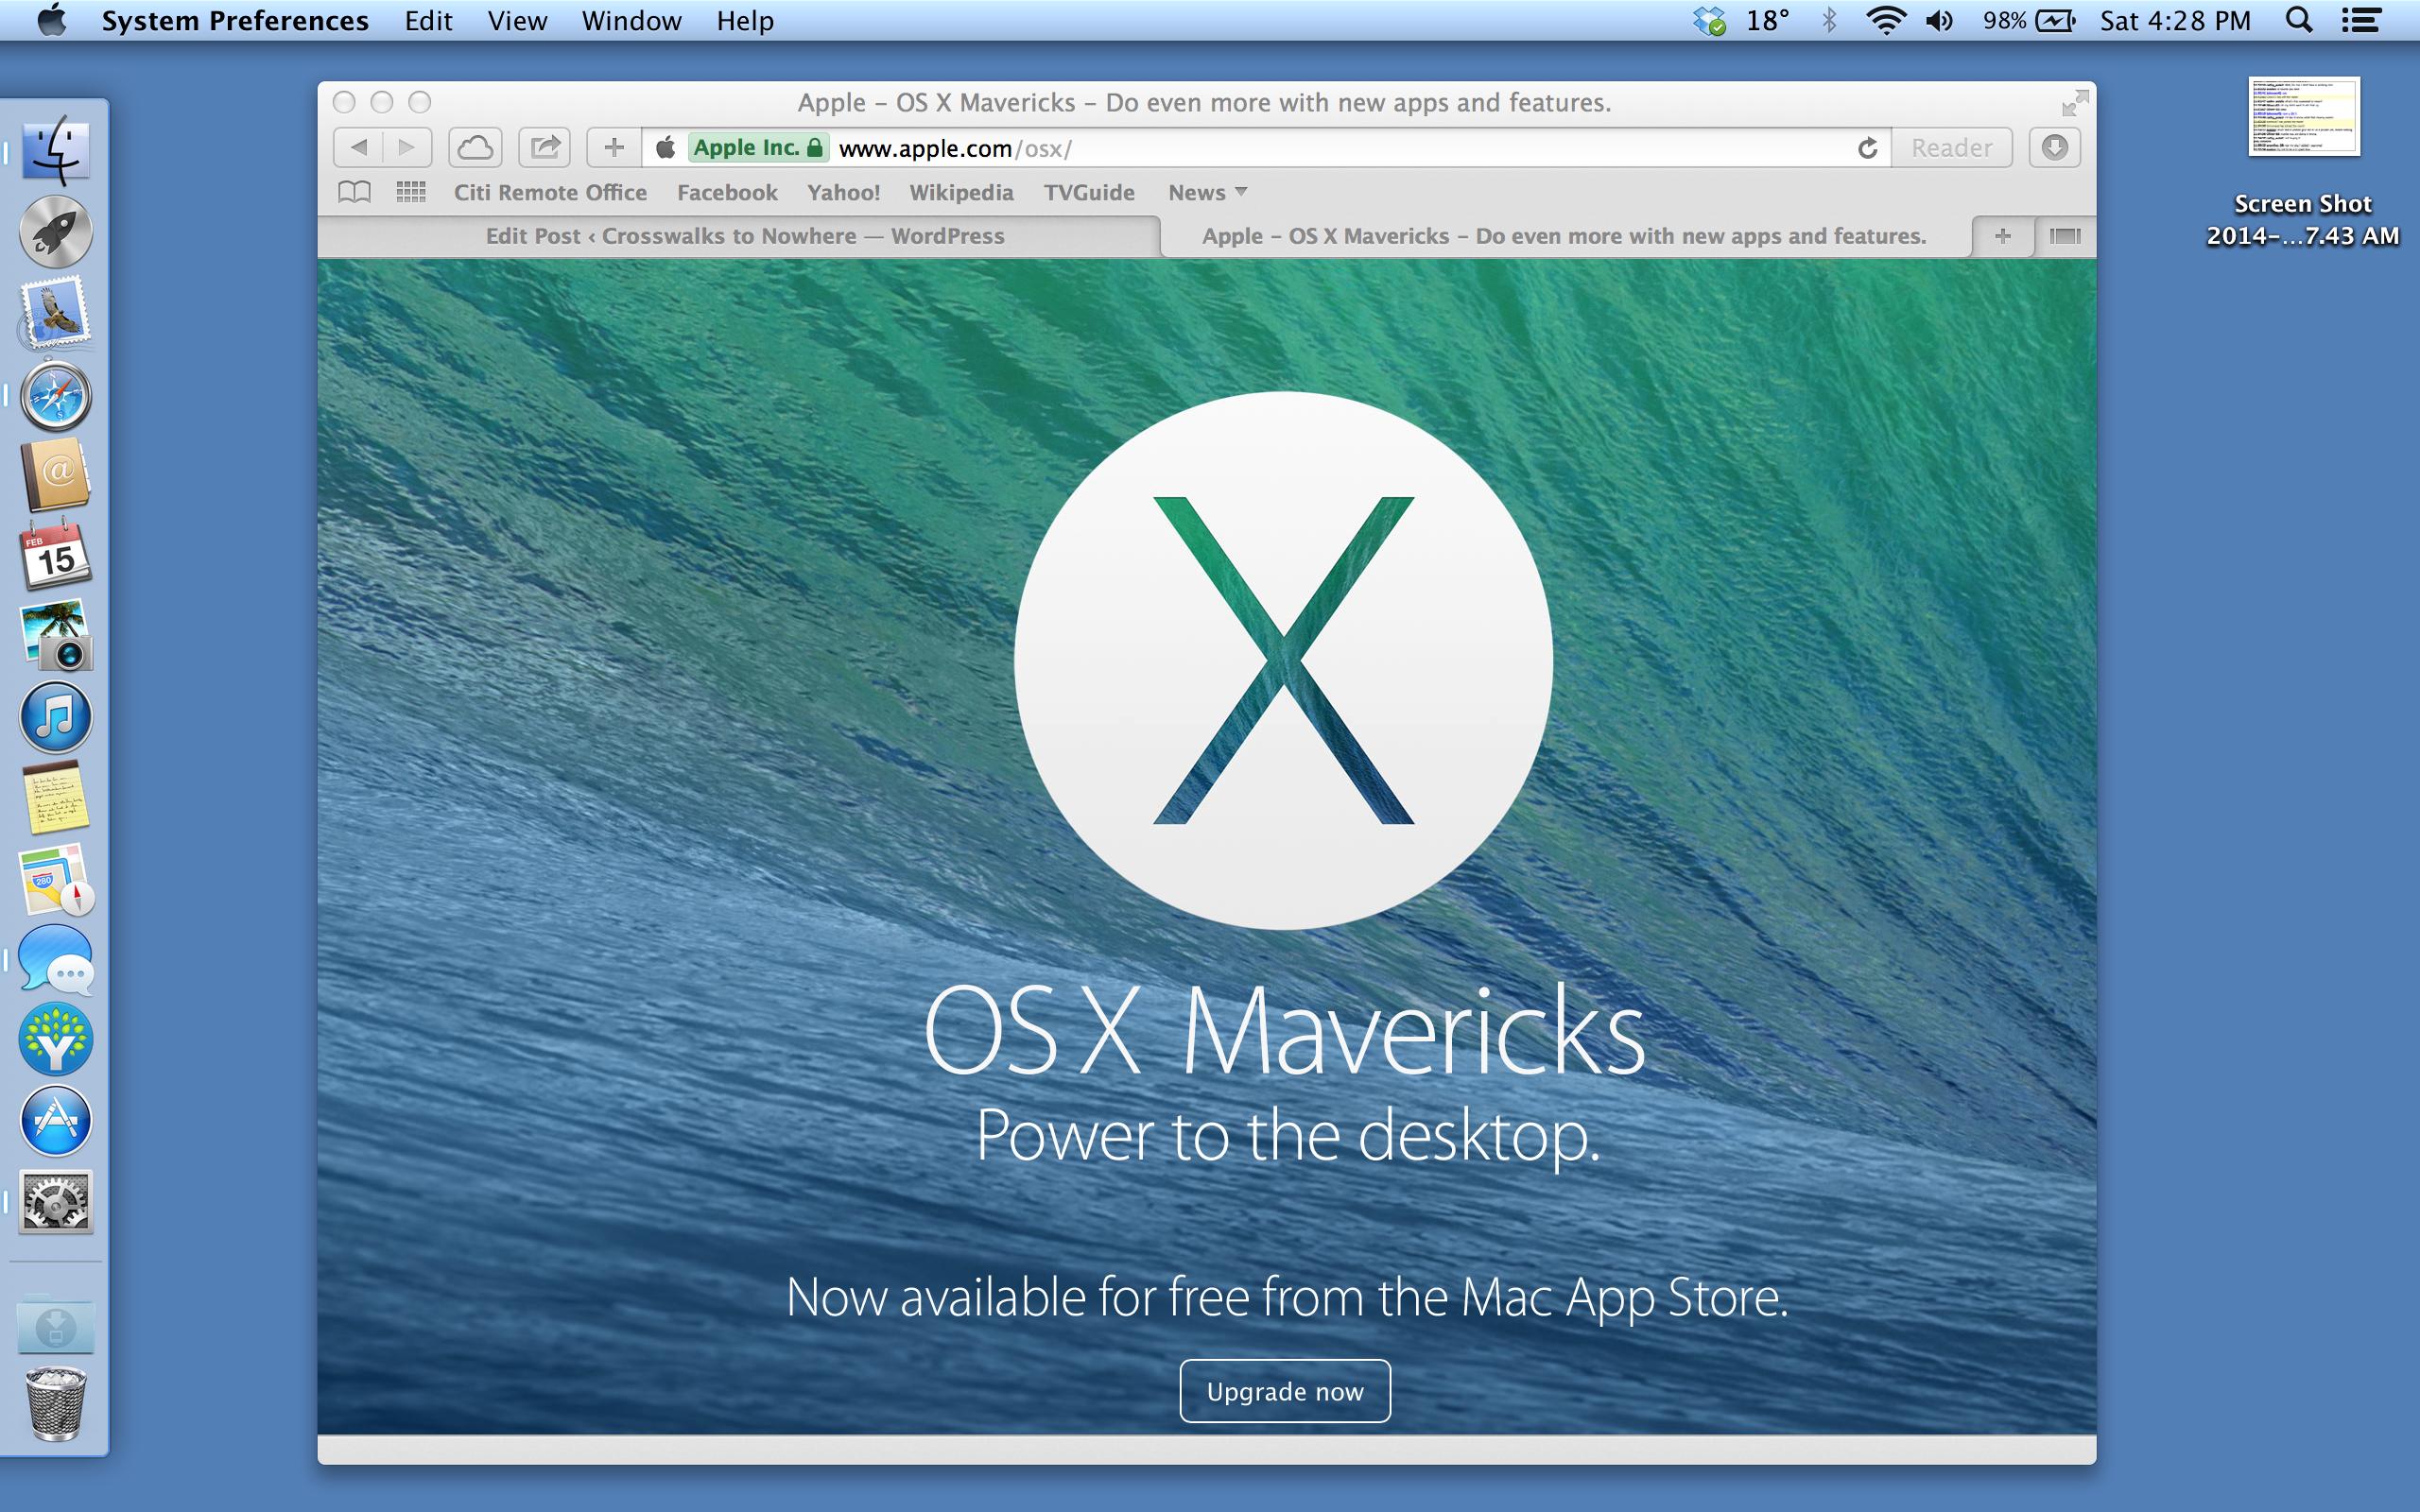 OSX Mavericks Rebuild Guide